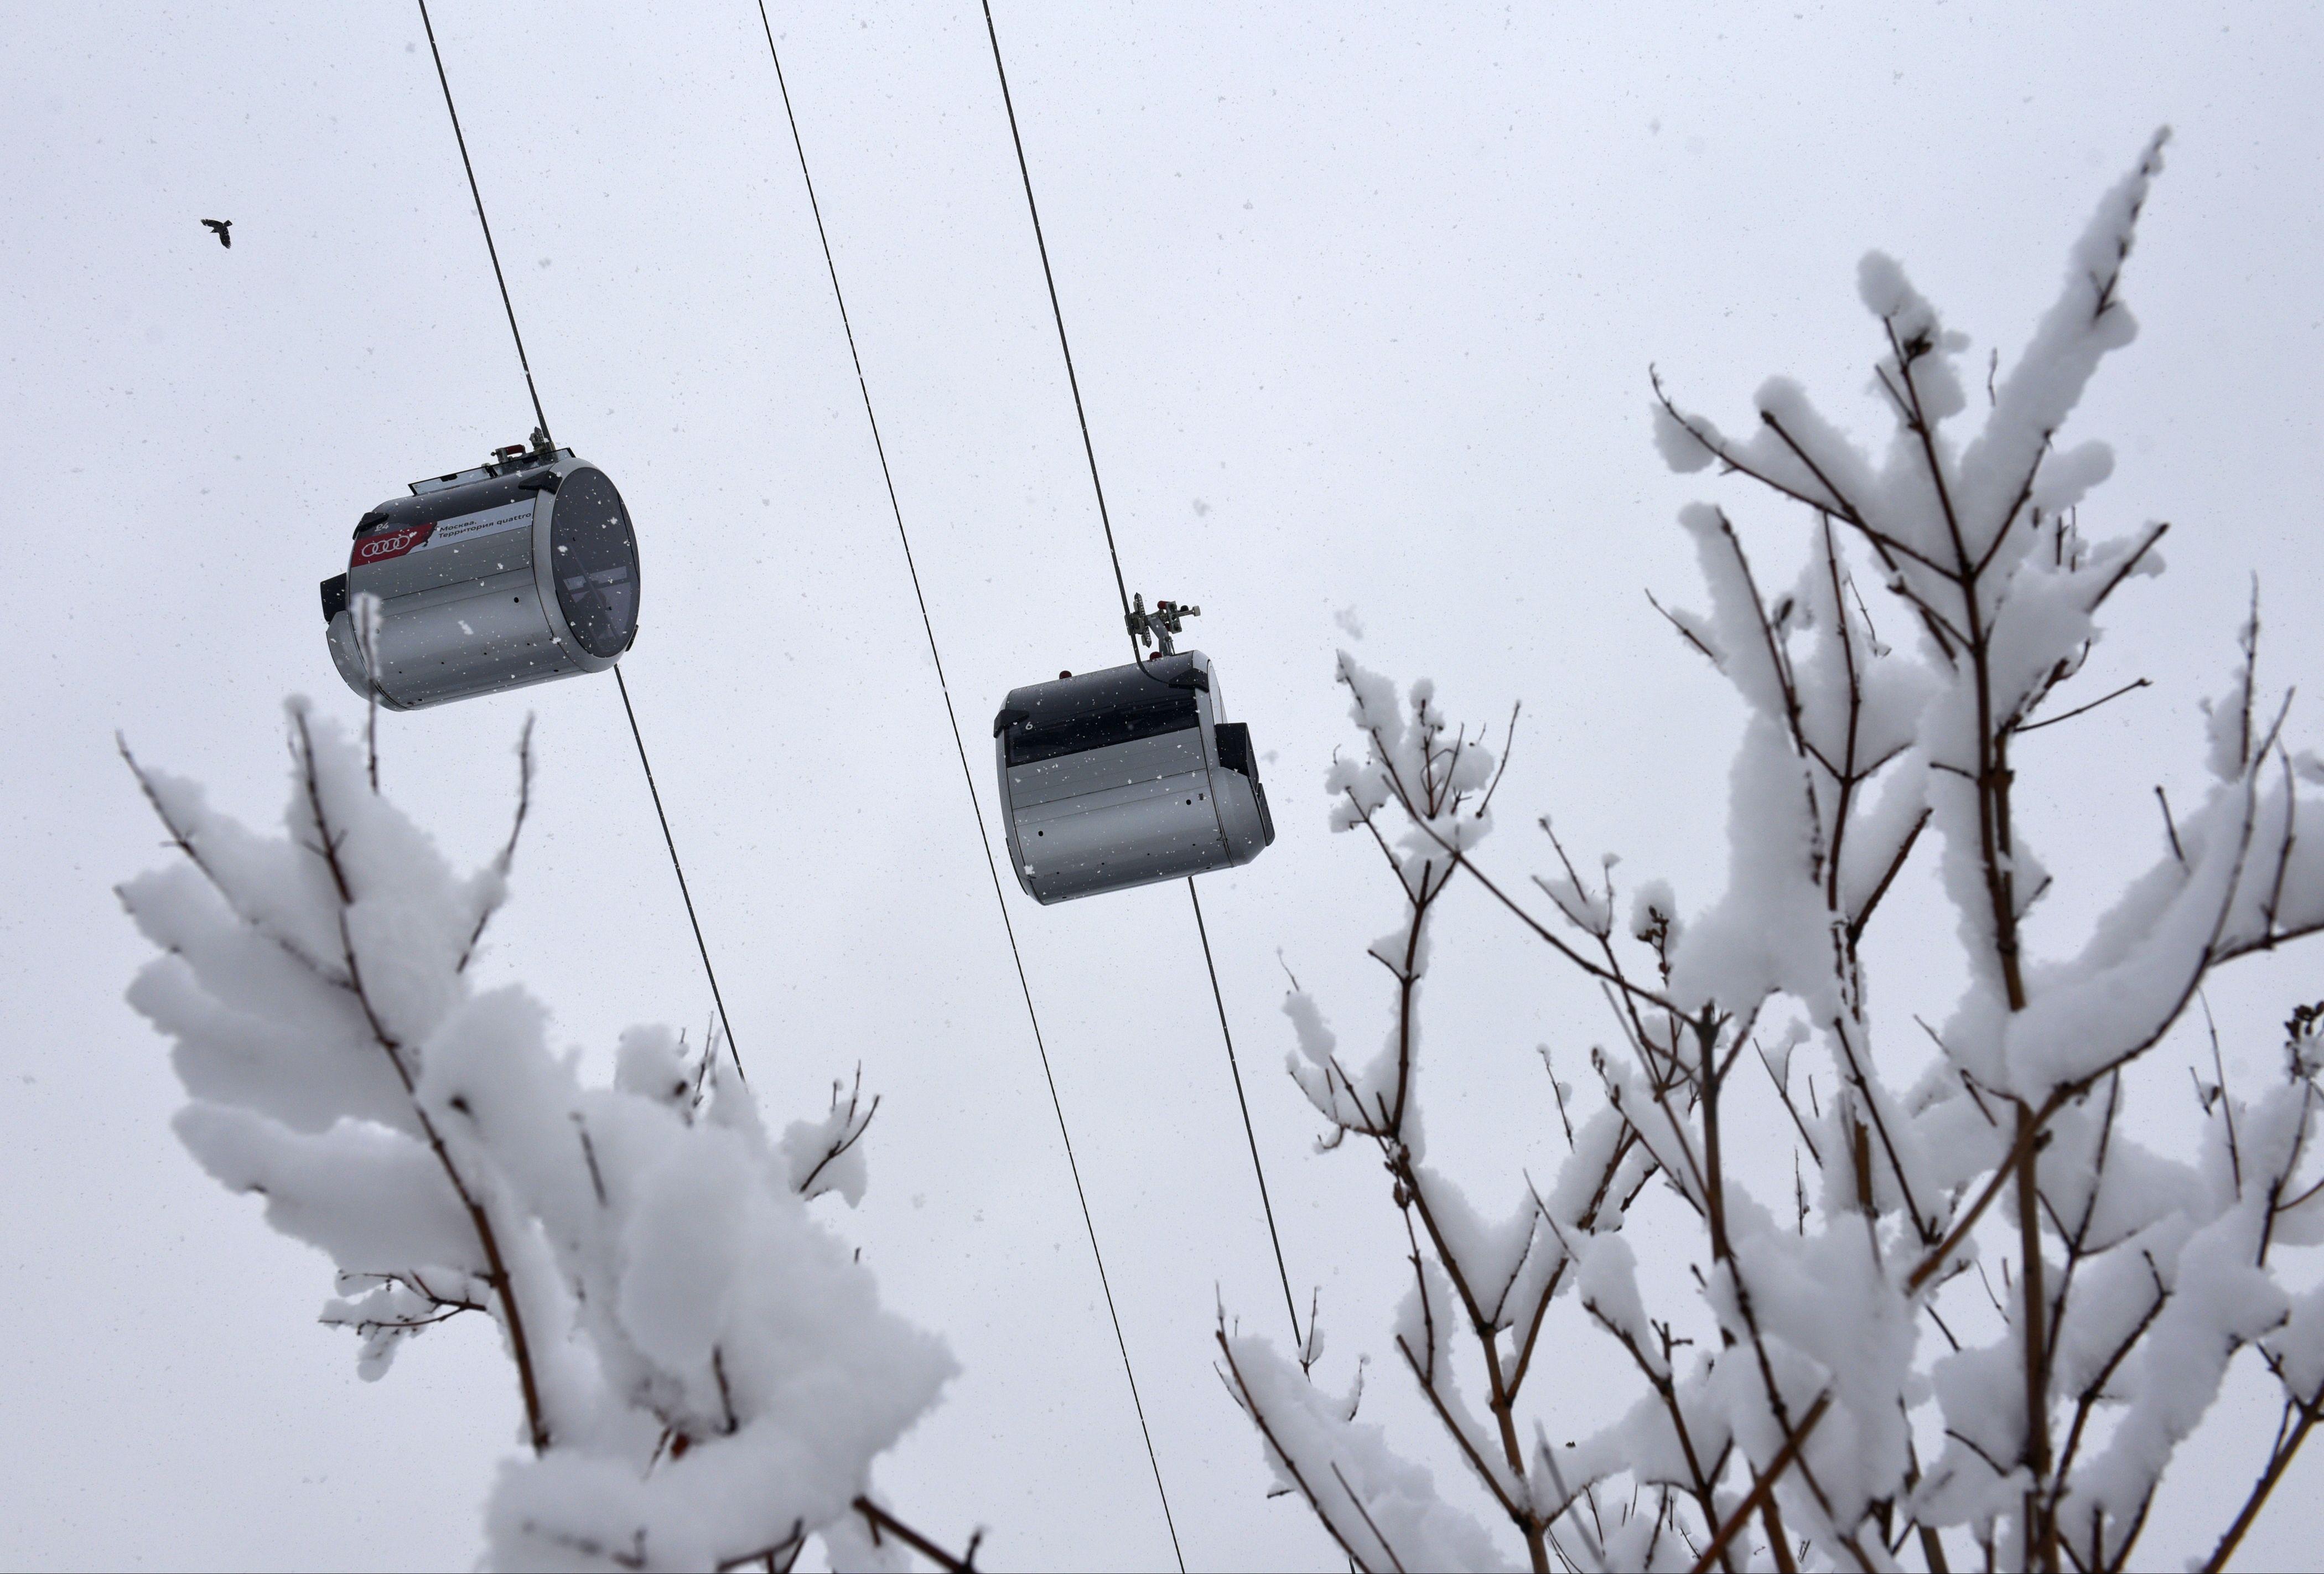 Заморозки накроют Москву в четверг